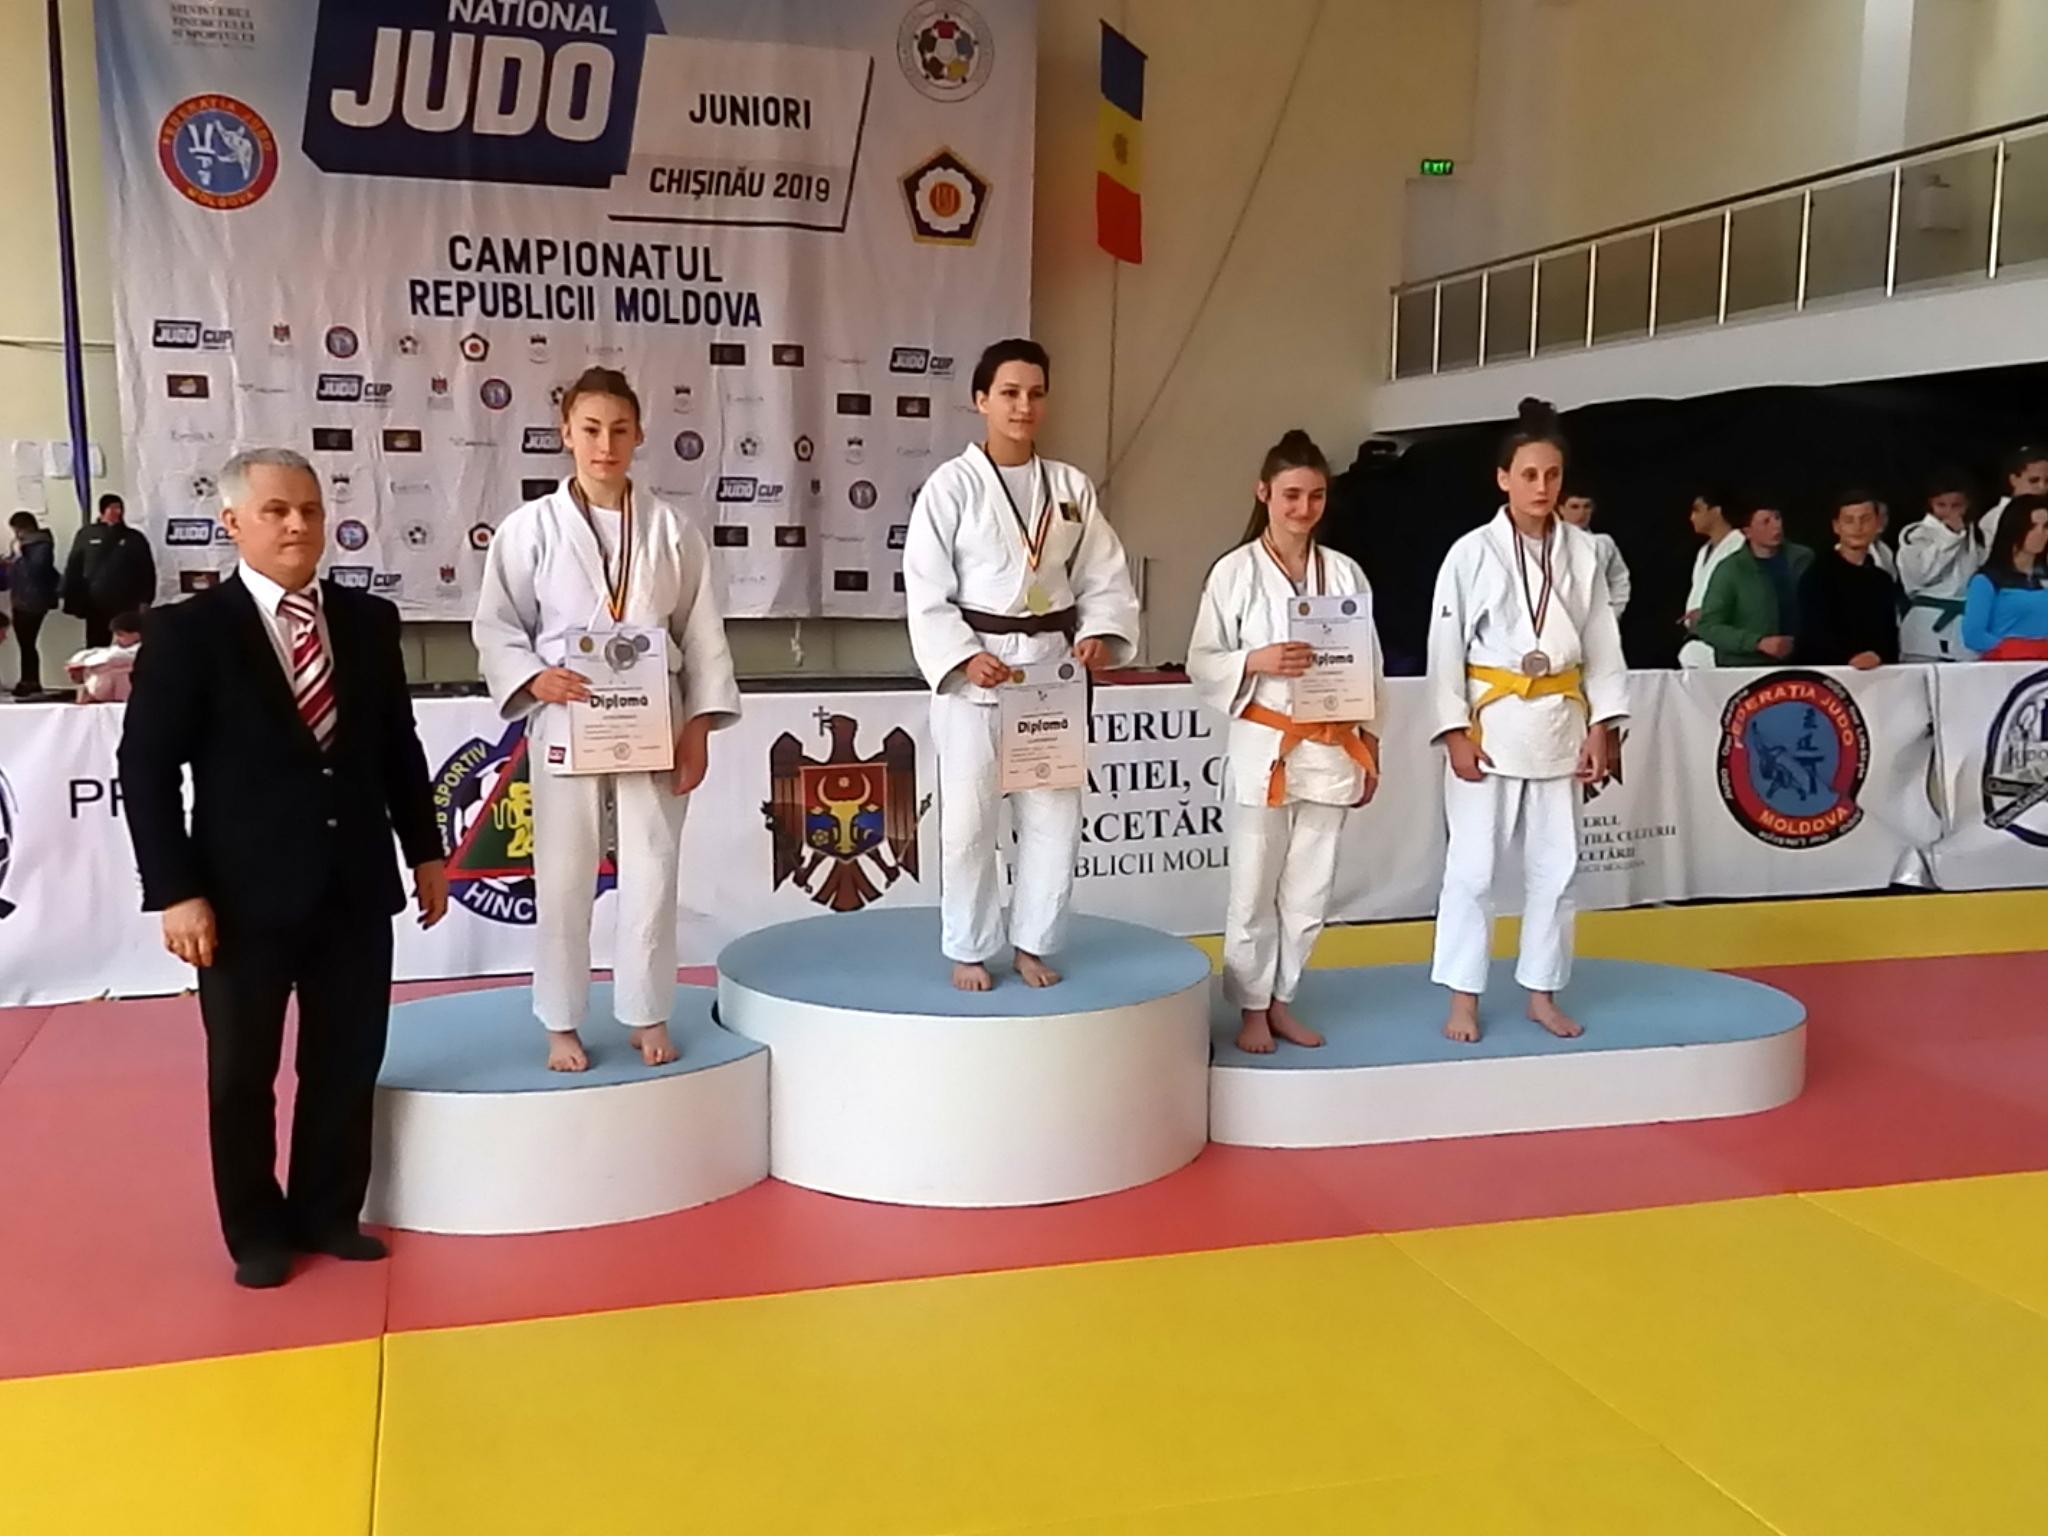 Judo.MD 2019 * PHOTO * C.R.Moldova (juniori)  20.04.2019